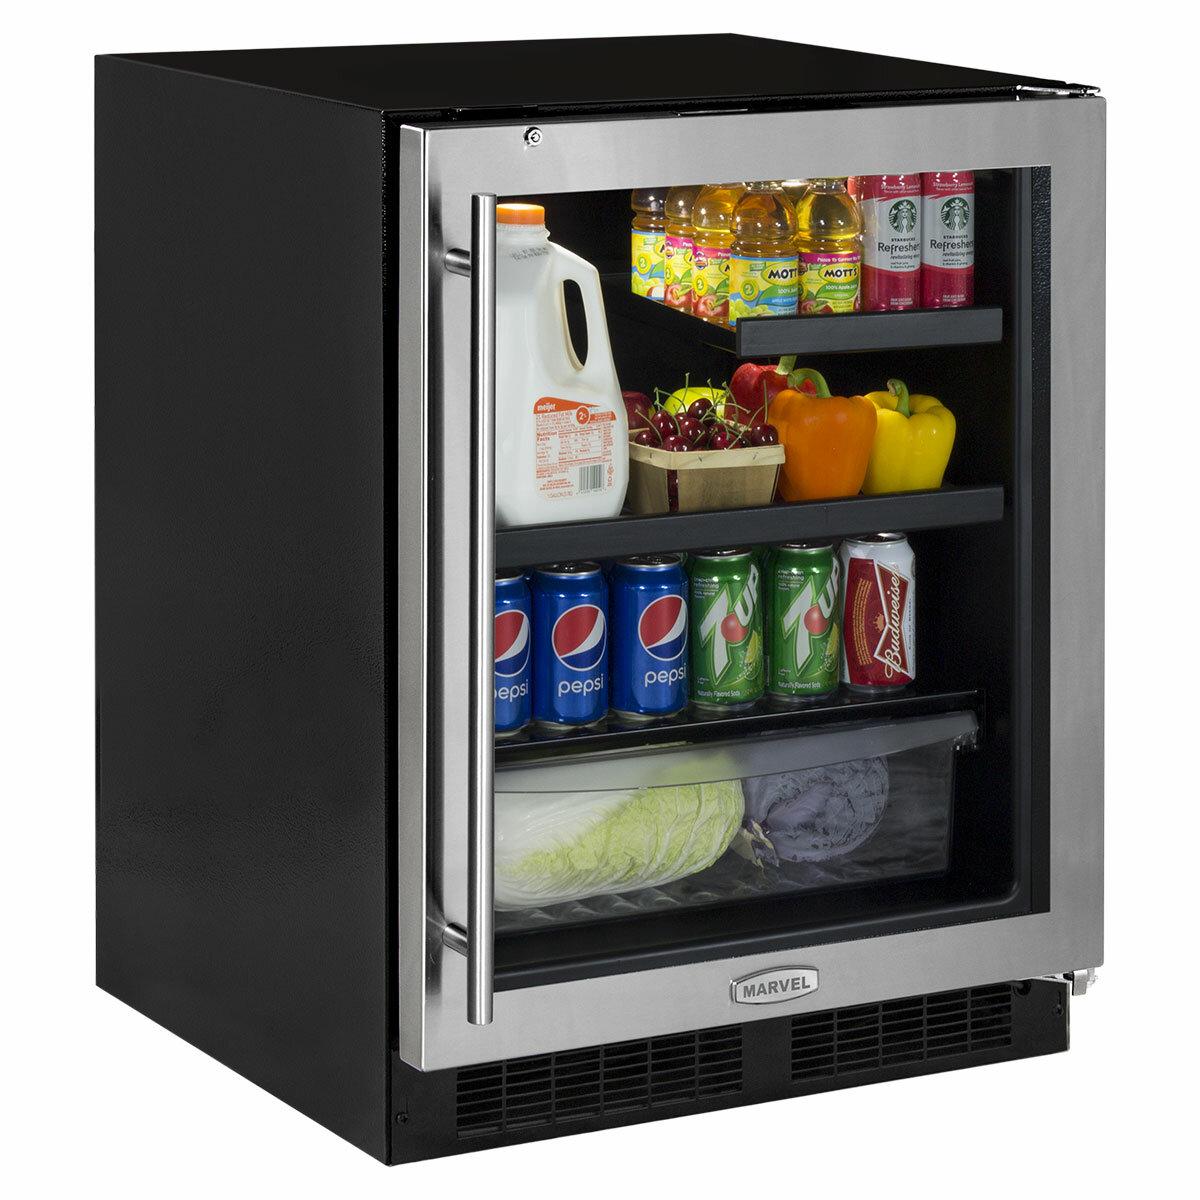 Marvel Low Profile 95 Can 24 Undercounter Beverage Refrigerator Wayfair